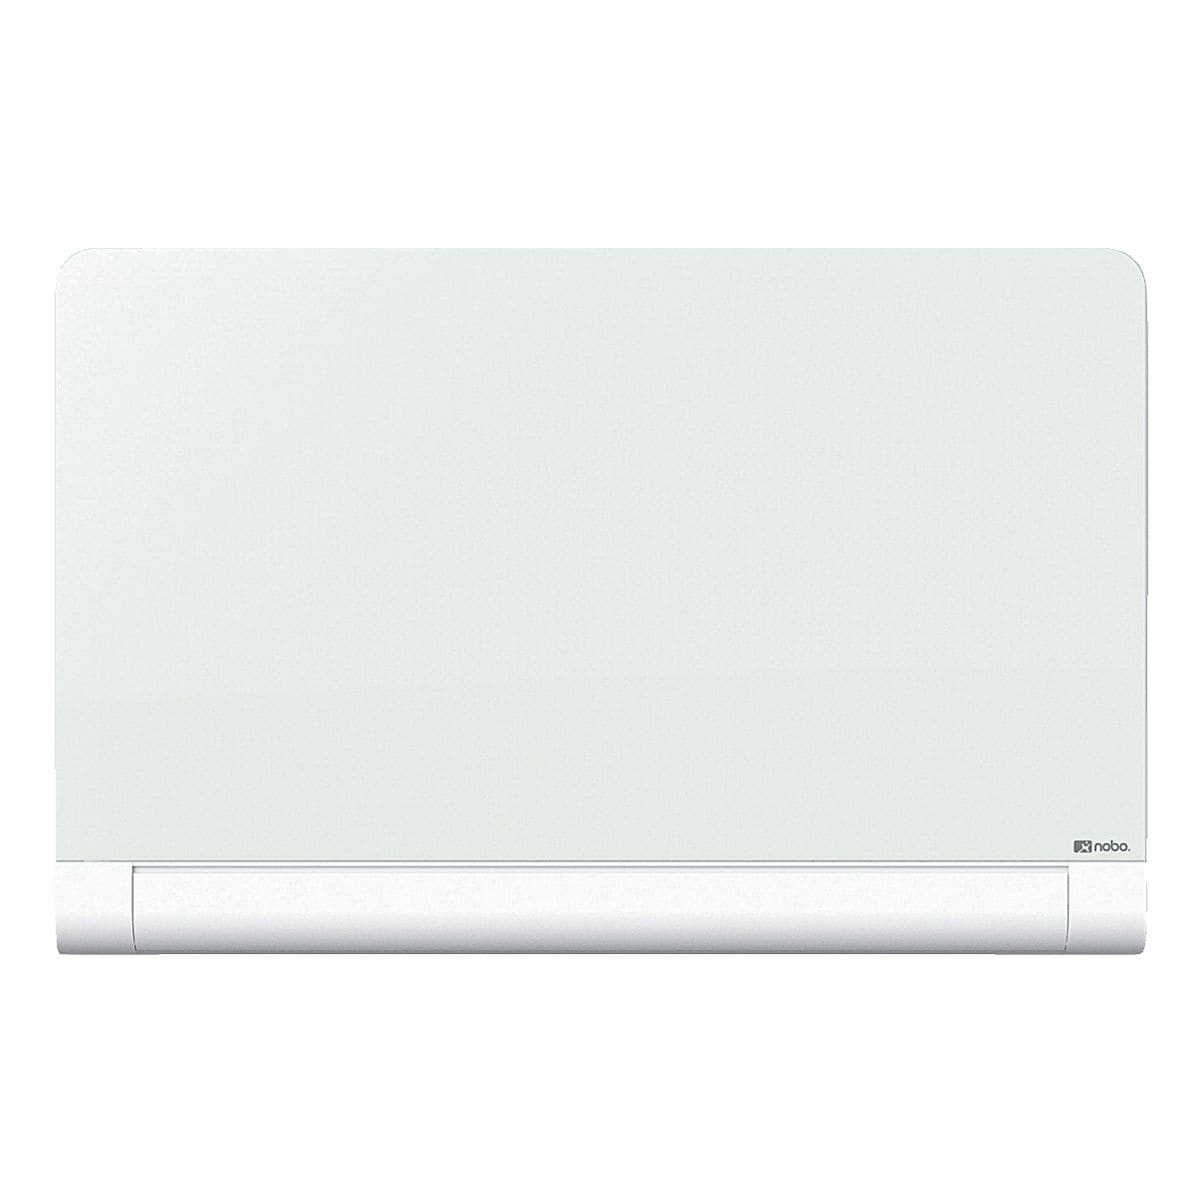 Nobo Whiteboard Diamond, 99,3x55,9 cm